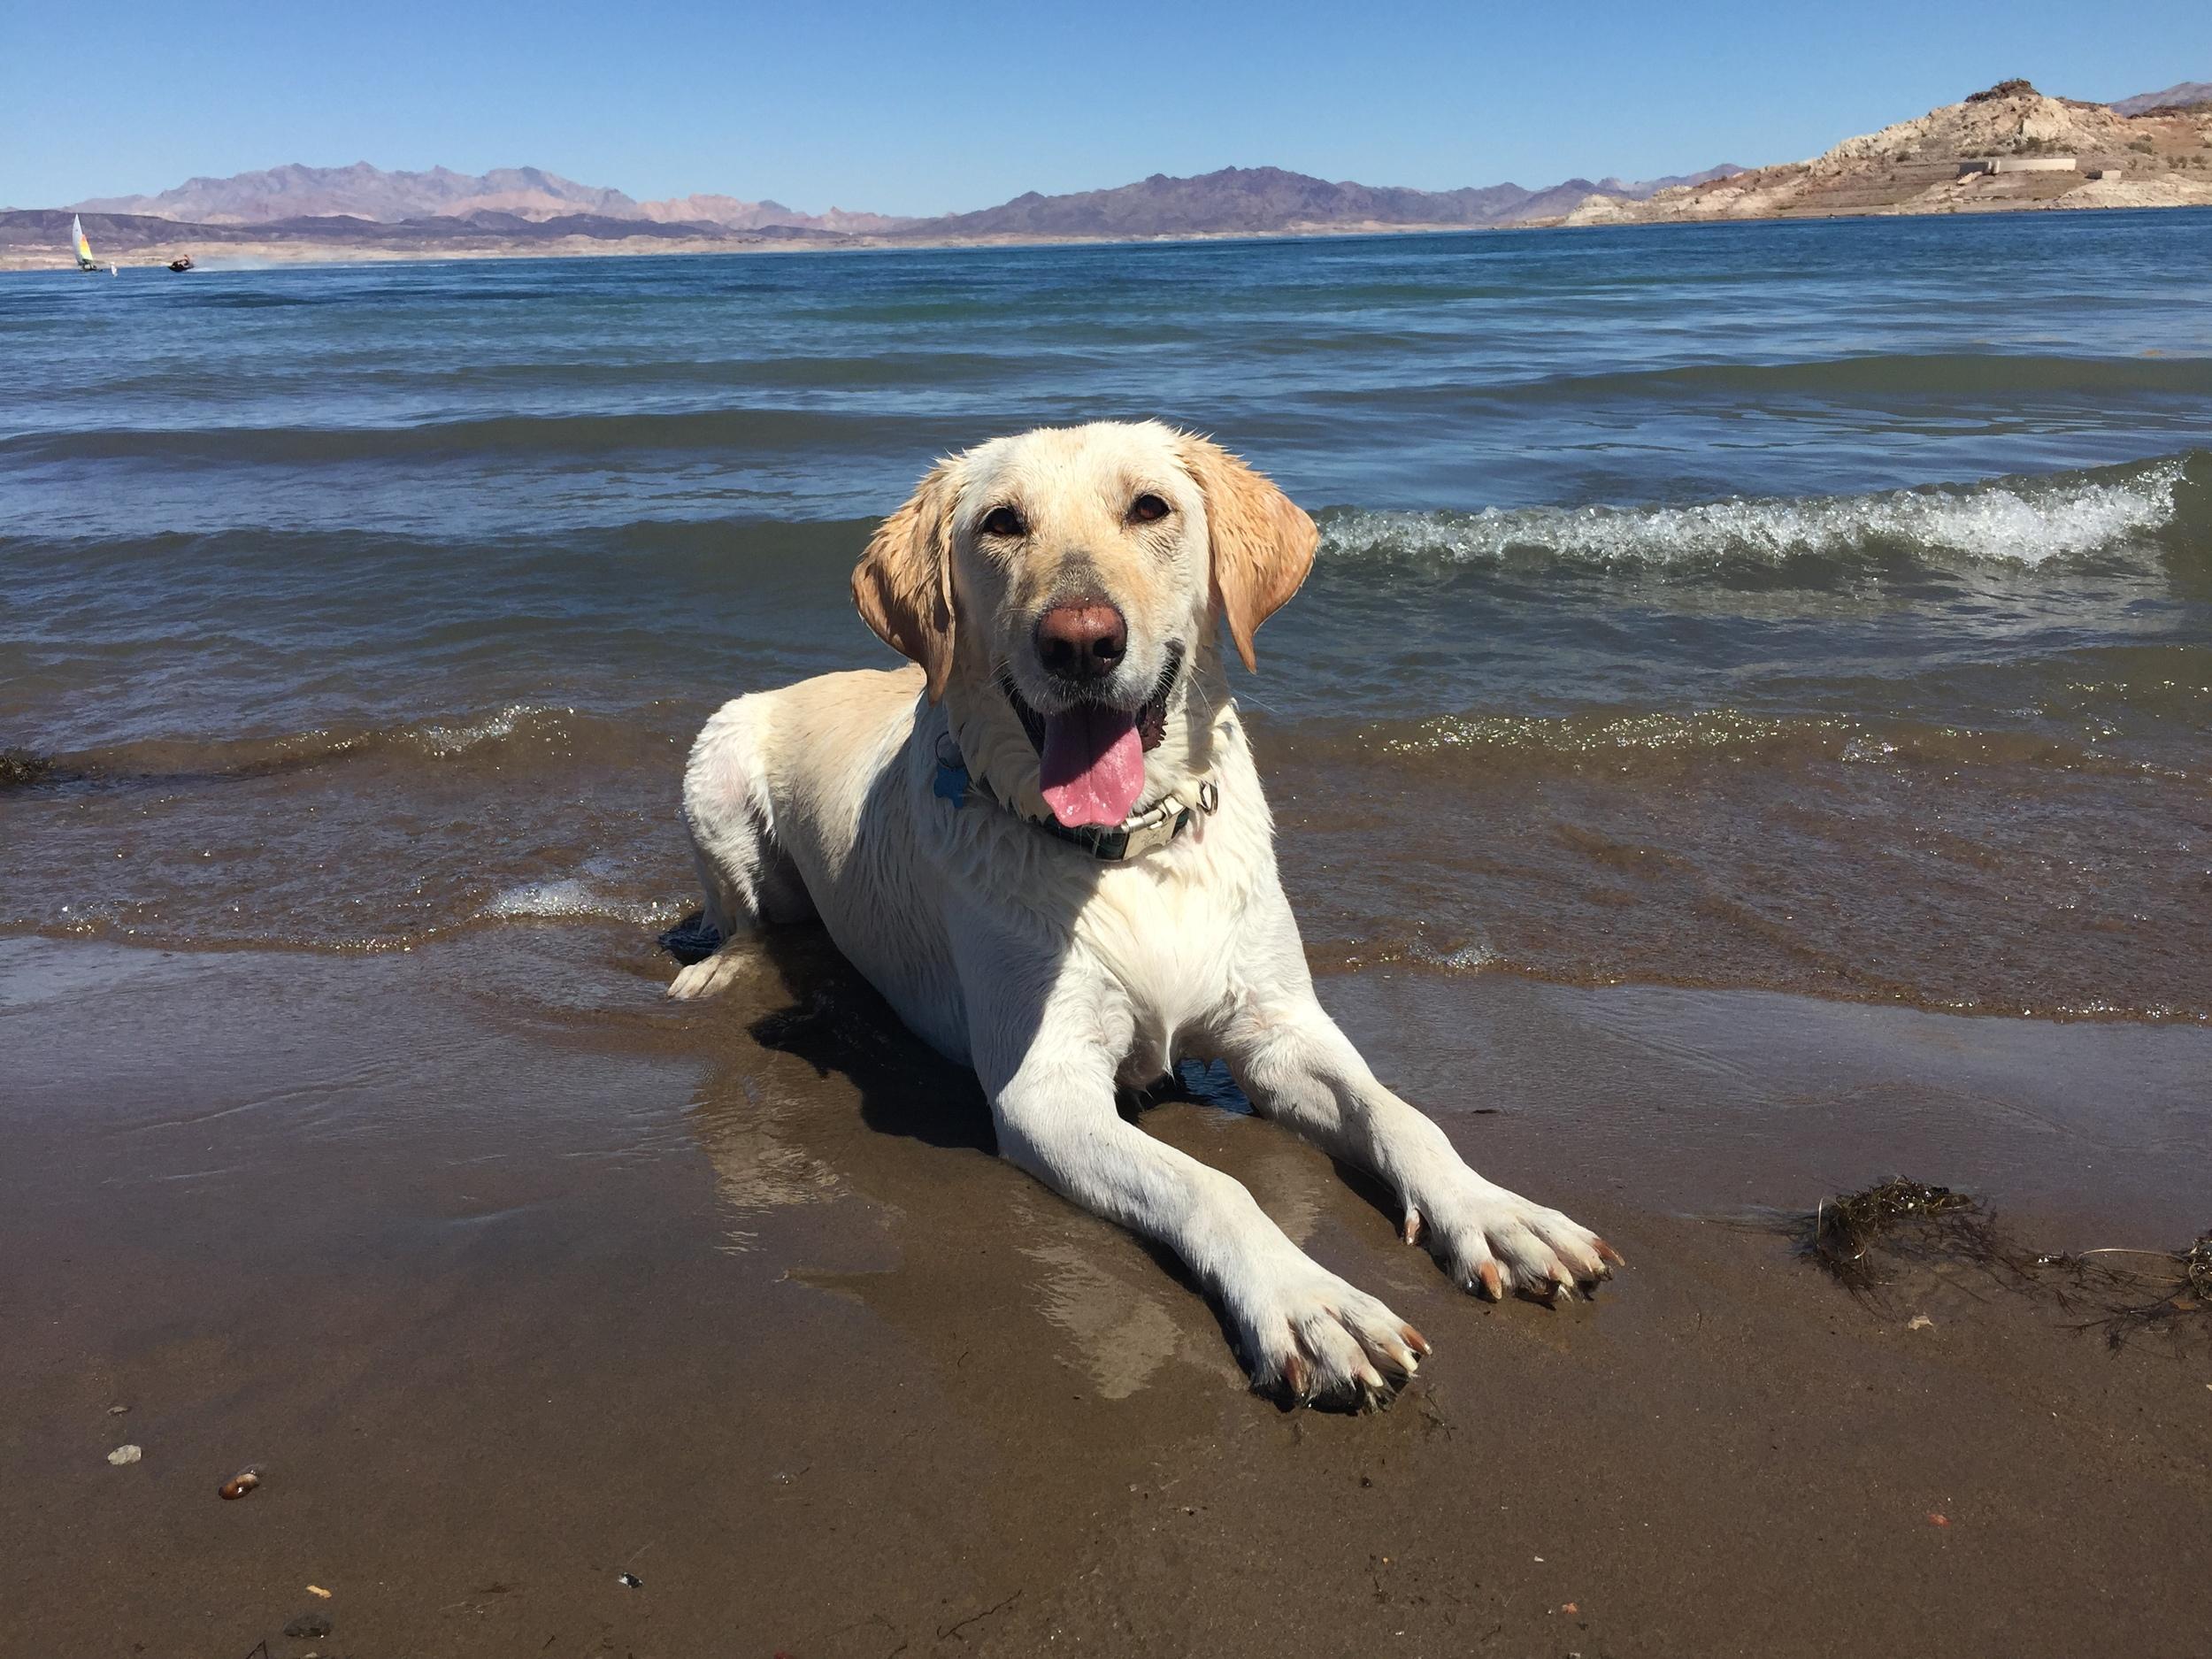 Bear enjoying Lake Mead - iPhone photo.